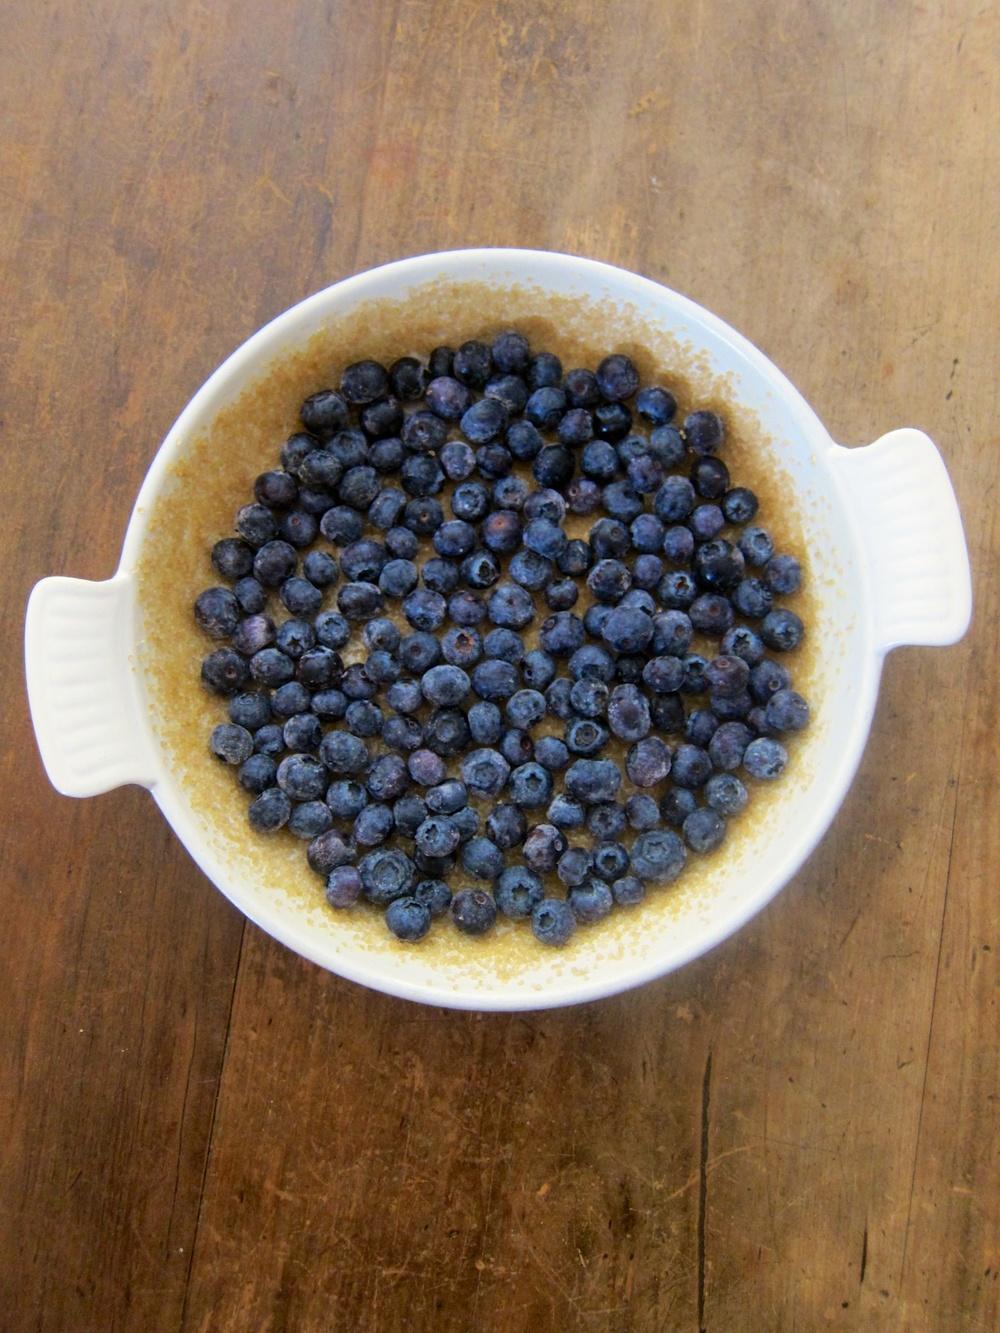 BlueberryFlaugnarde_5.jpg